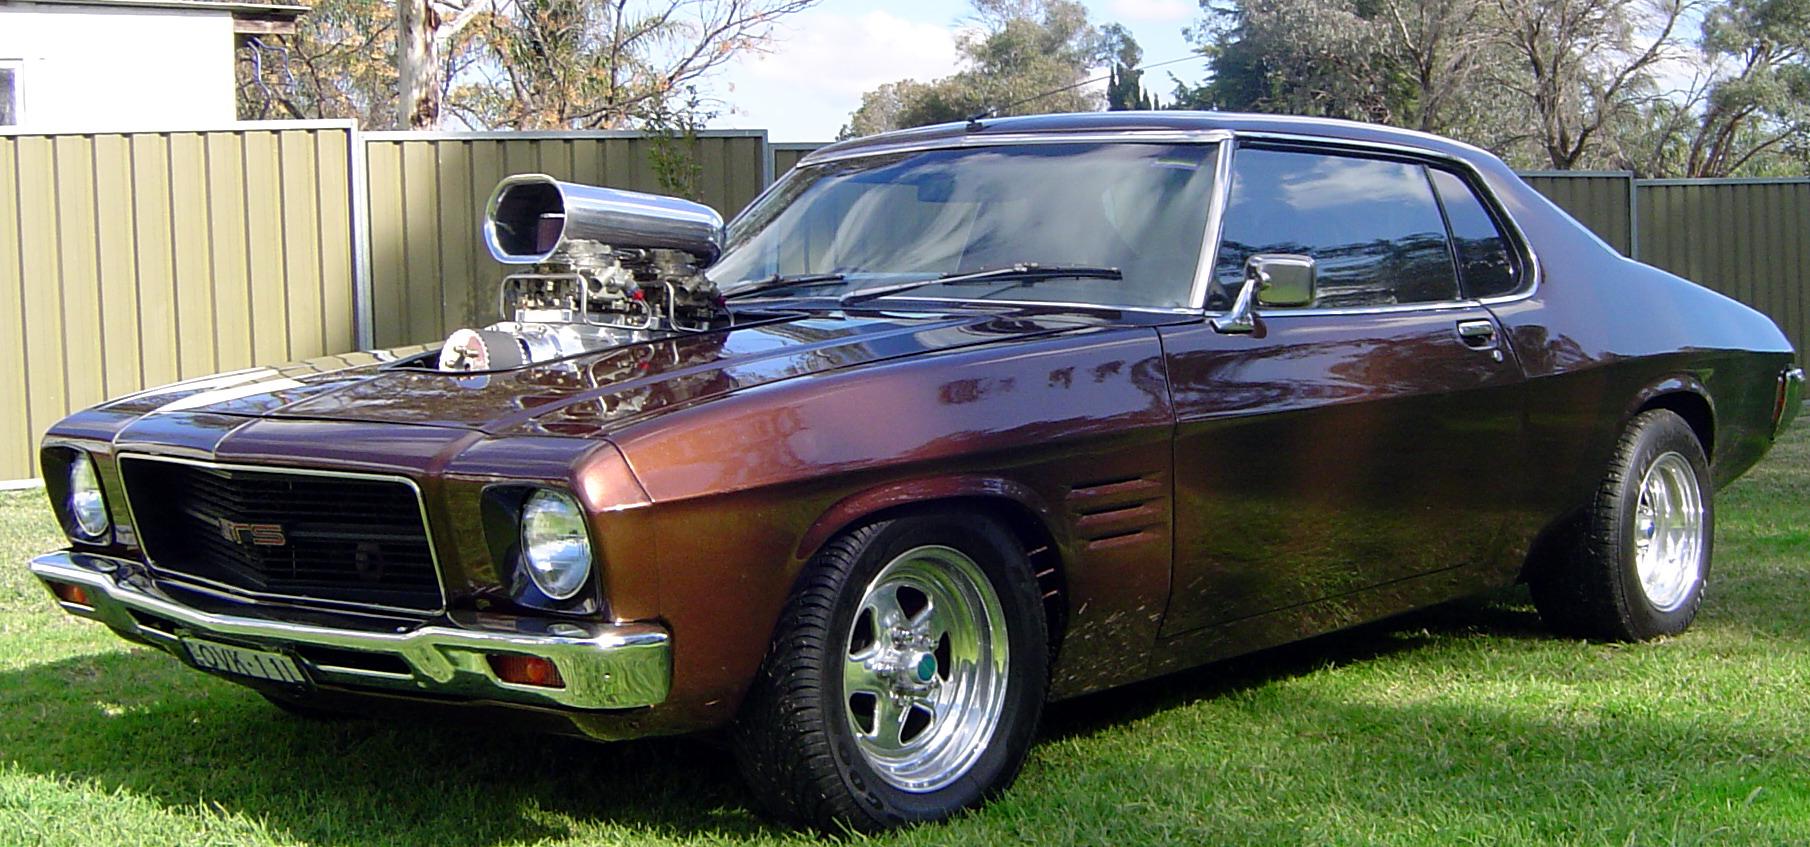 Holden Monaro Gts Photos Reviews News Specs Buy Car